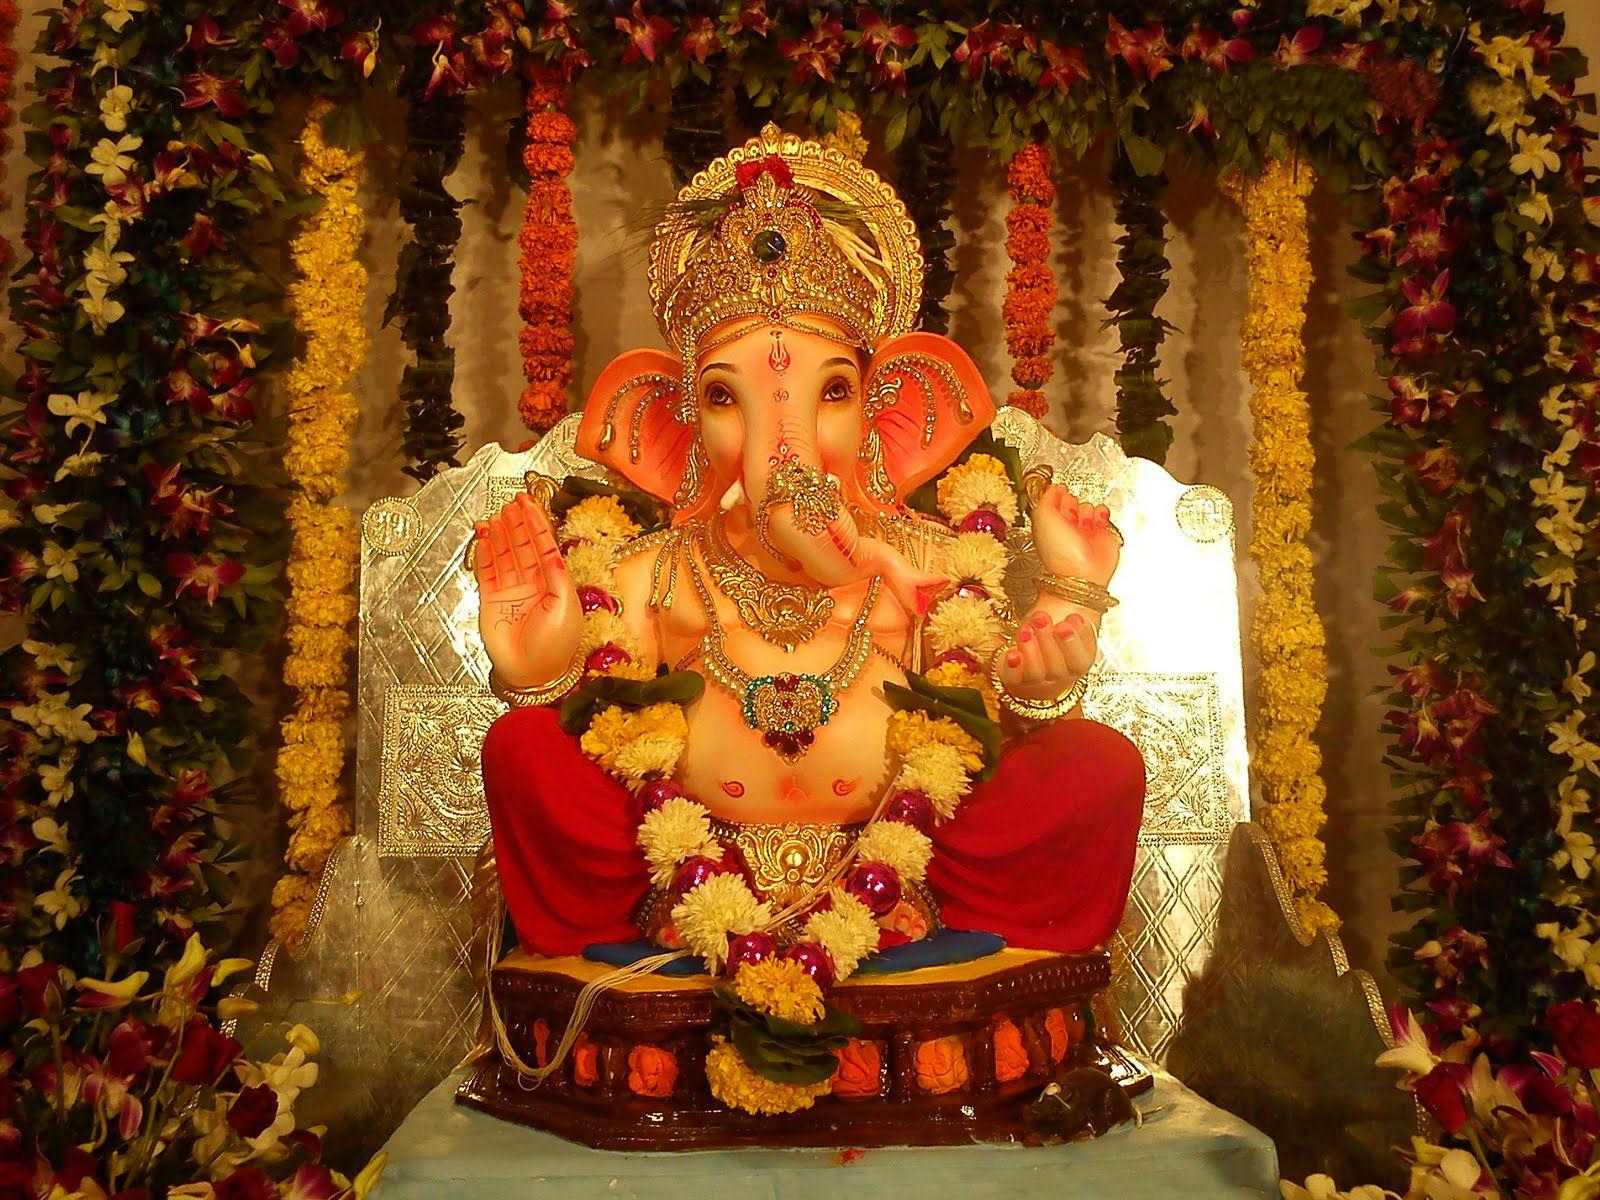 Lalbaugcha Raja Ganpati | 1600 x 1200 | Download | Close